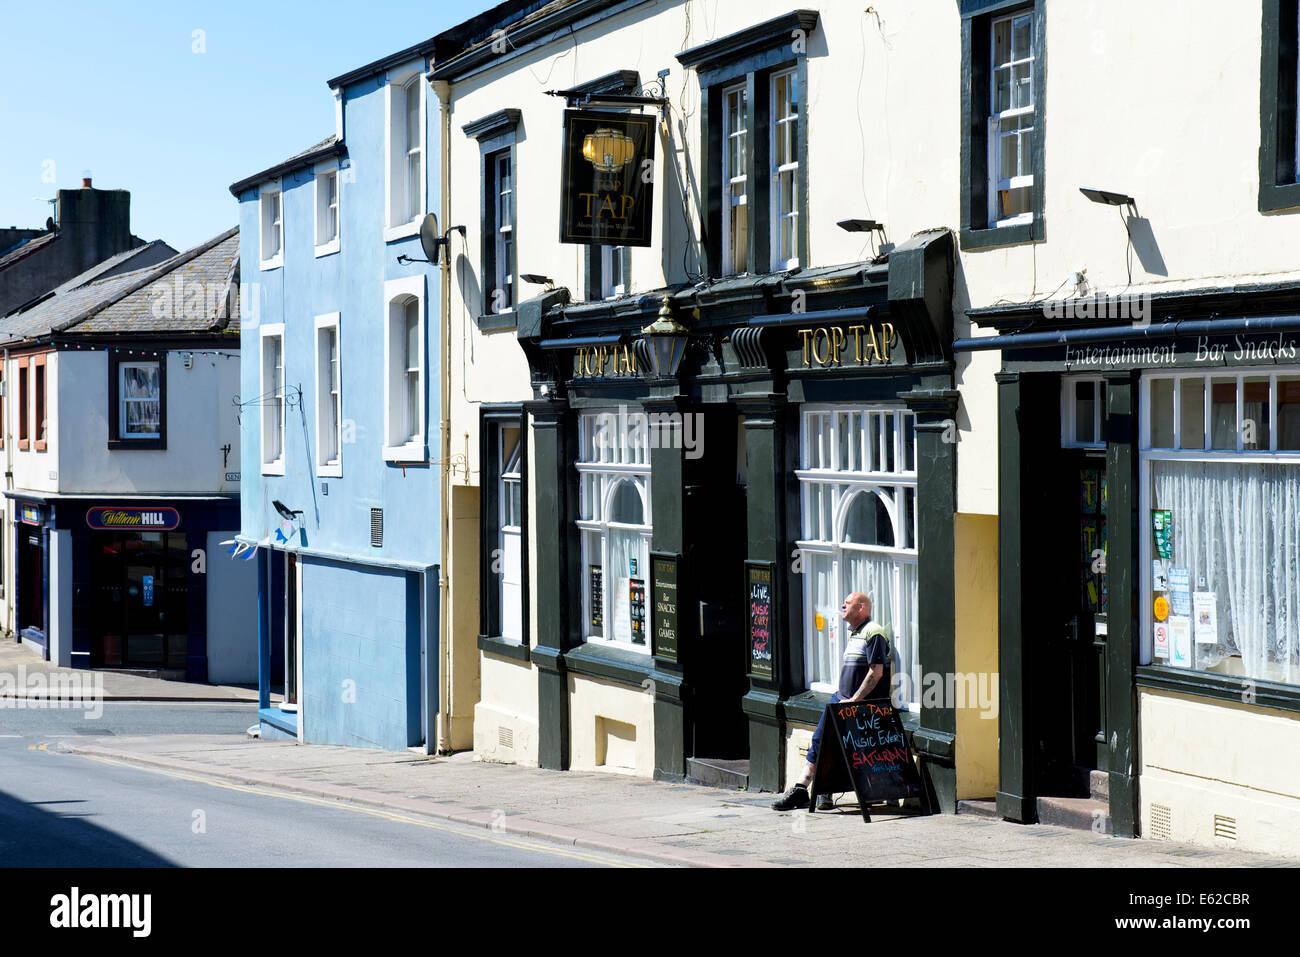 The Top Tap pub in Maryport, West Cumbria, England UK - Stock Image